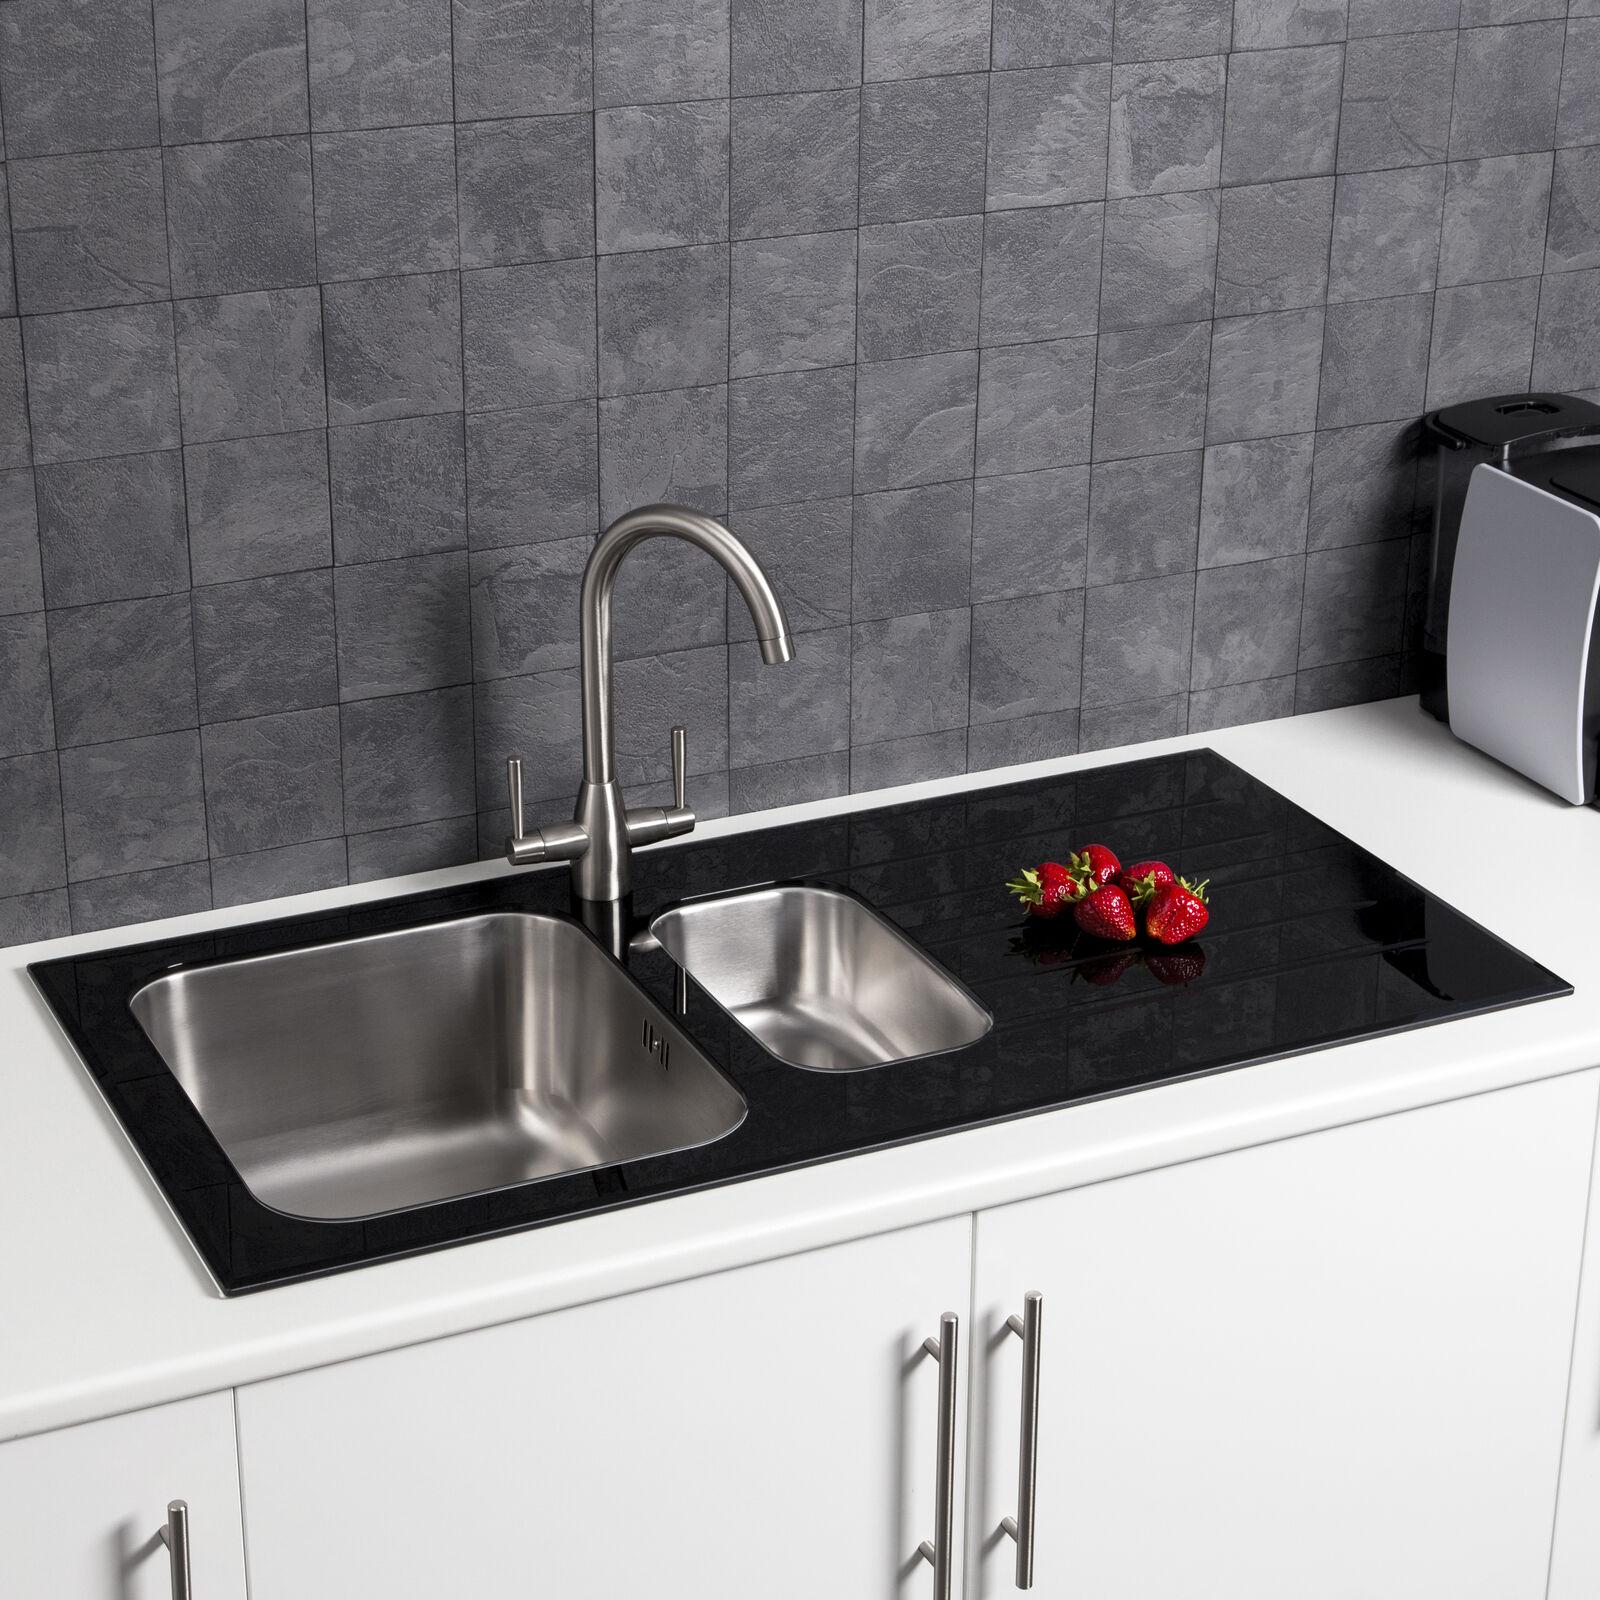 sauber ksink016b stainless steel 1 5 bowl kitchen sink 8mm black